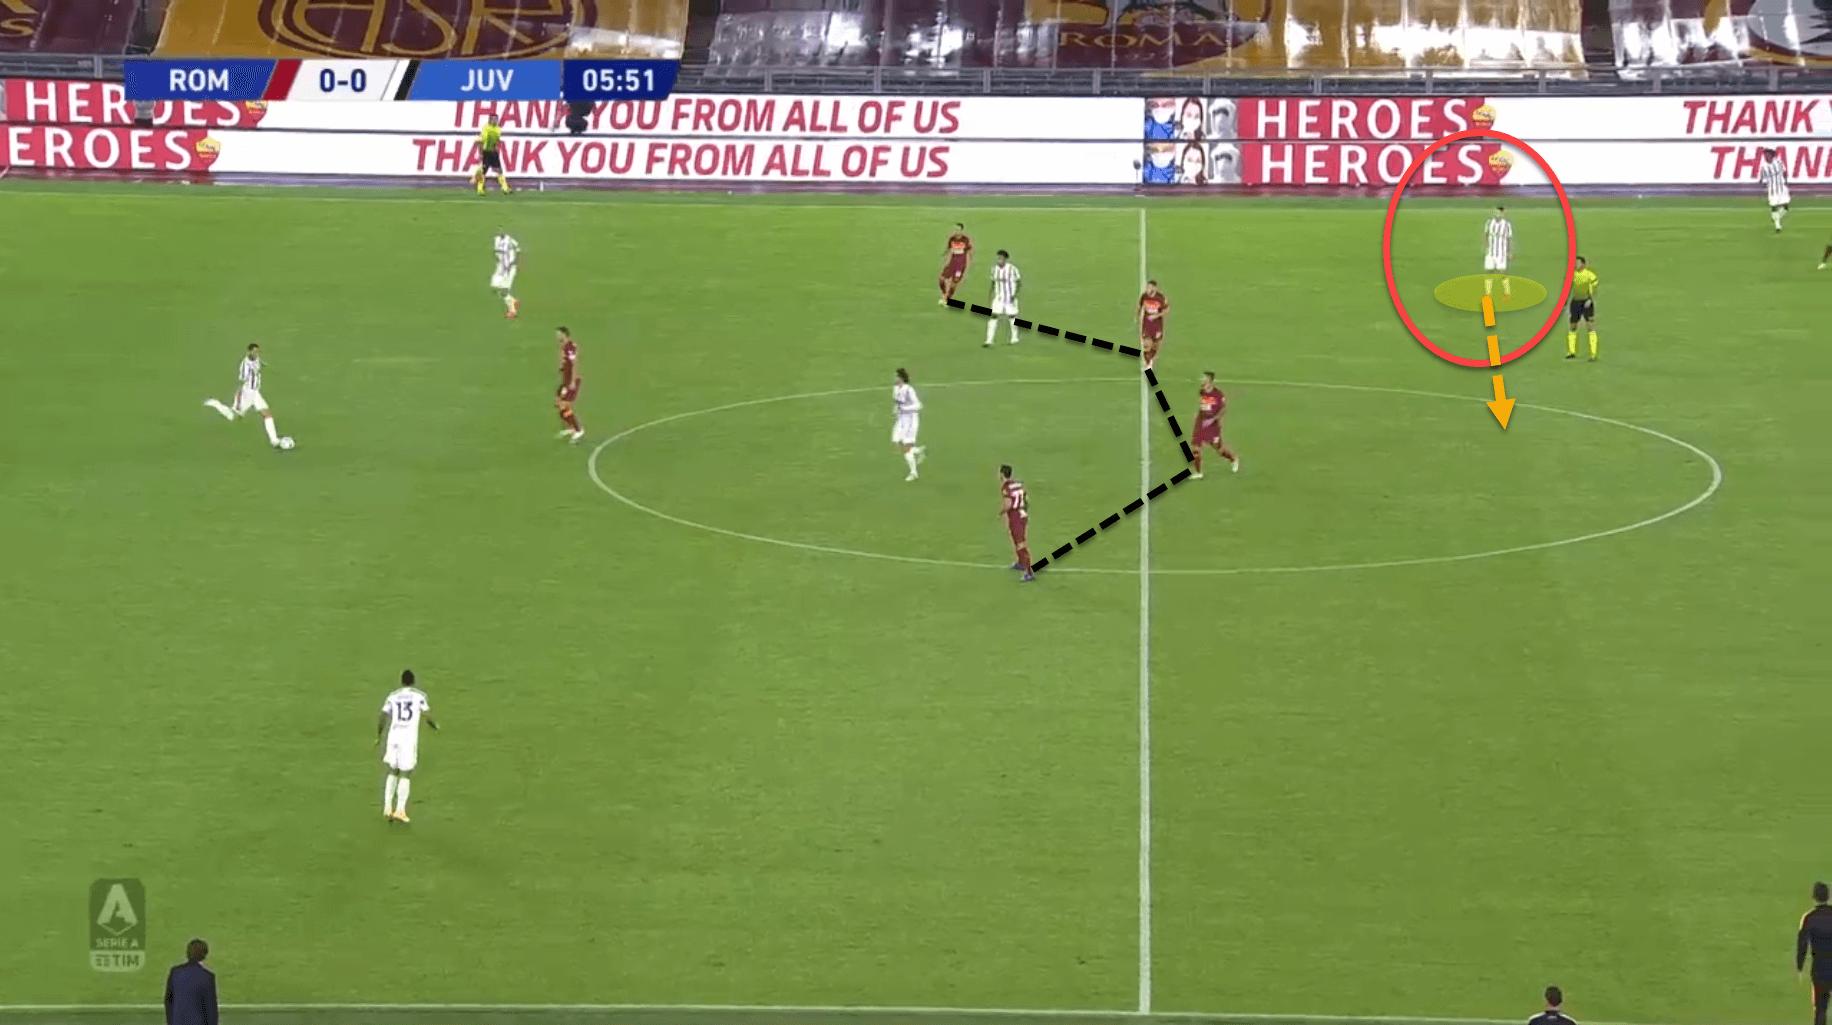 Aaron Ramsey 2020/21: How Andrea Pirlo has used the Welshman so far? – tactical analysis tactics